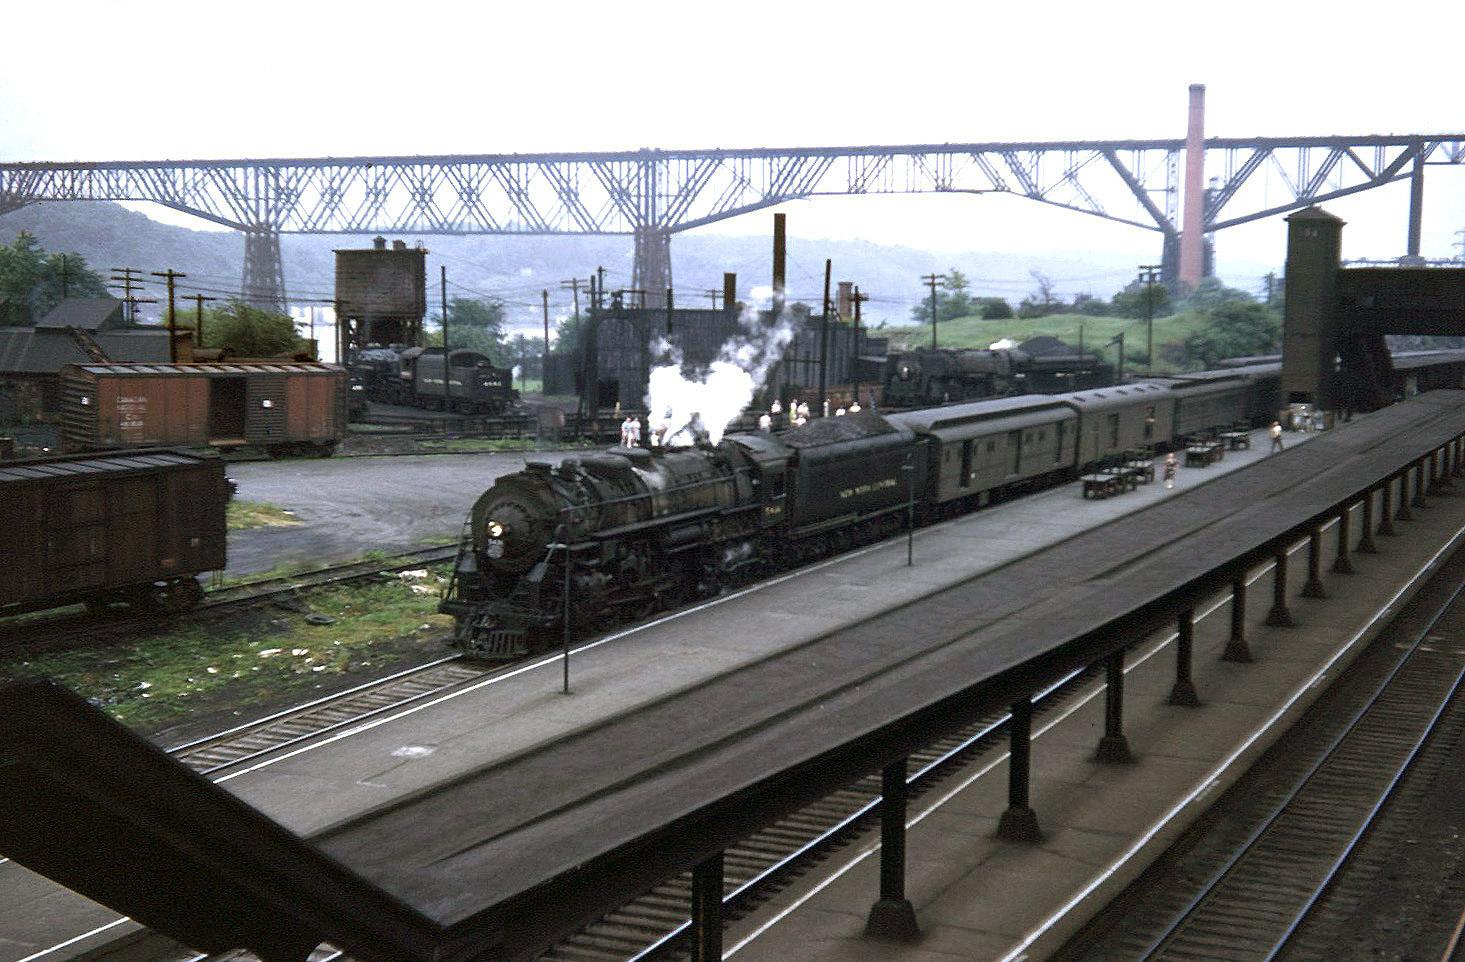 Train Travel From Nyc To Niagara Falls